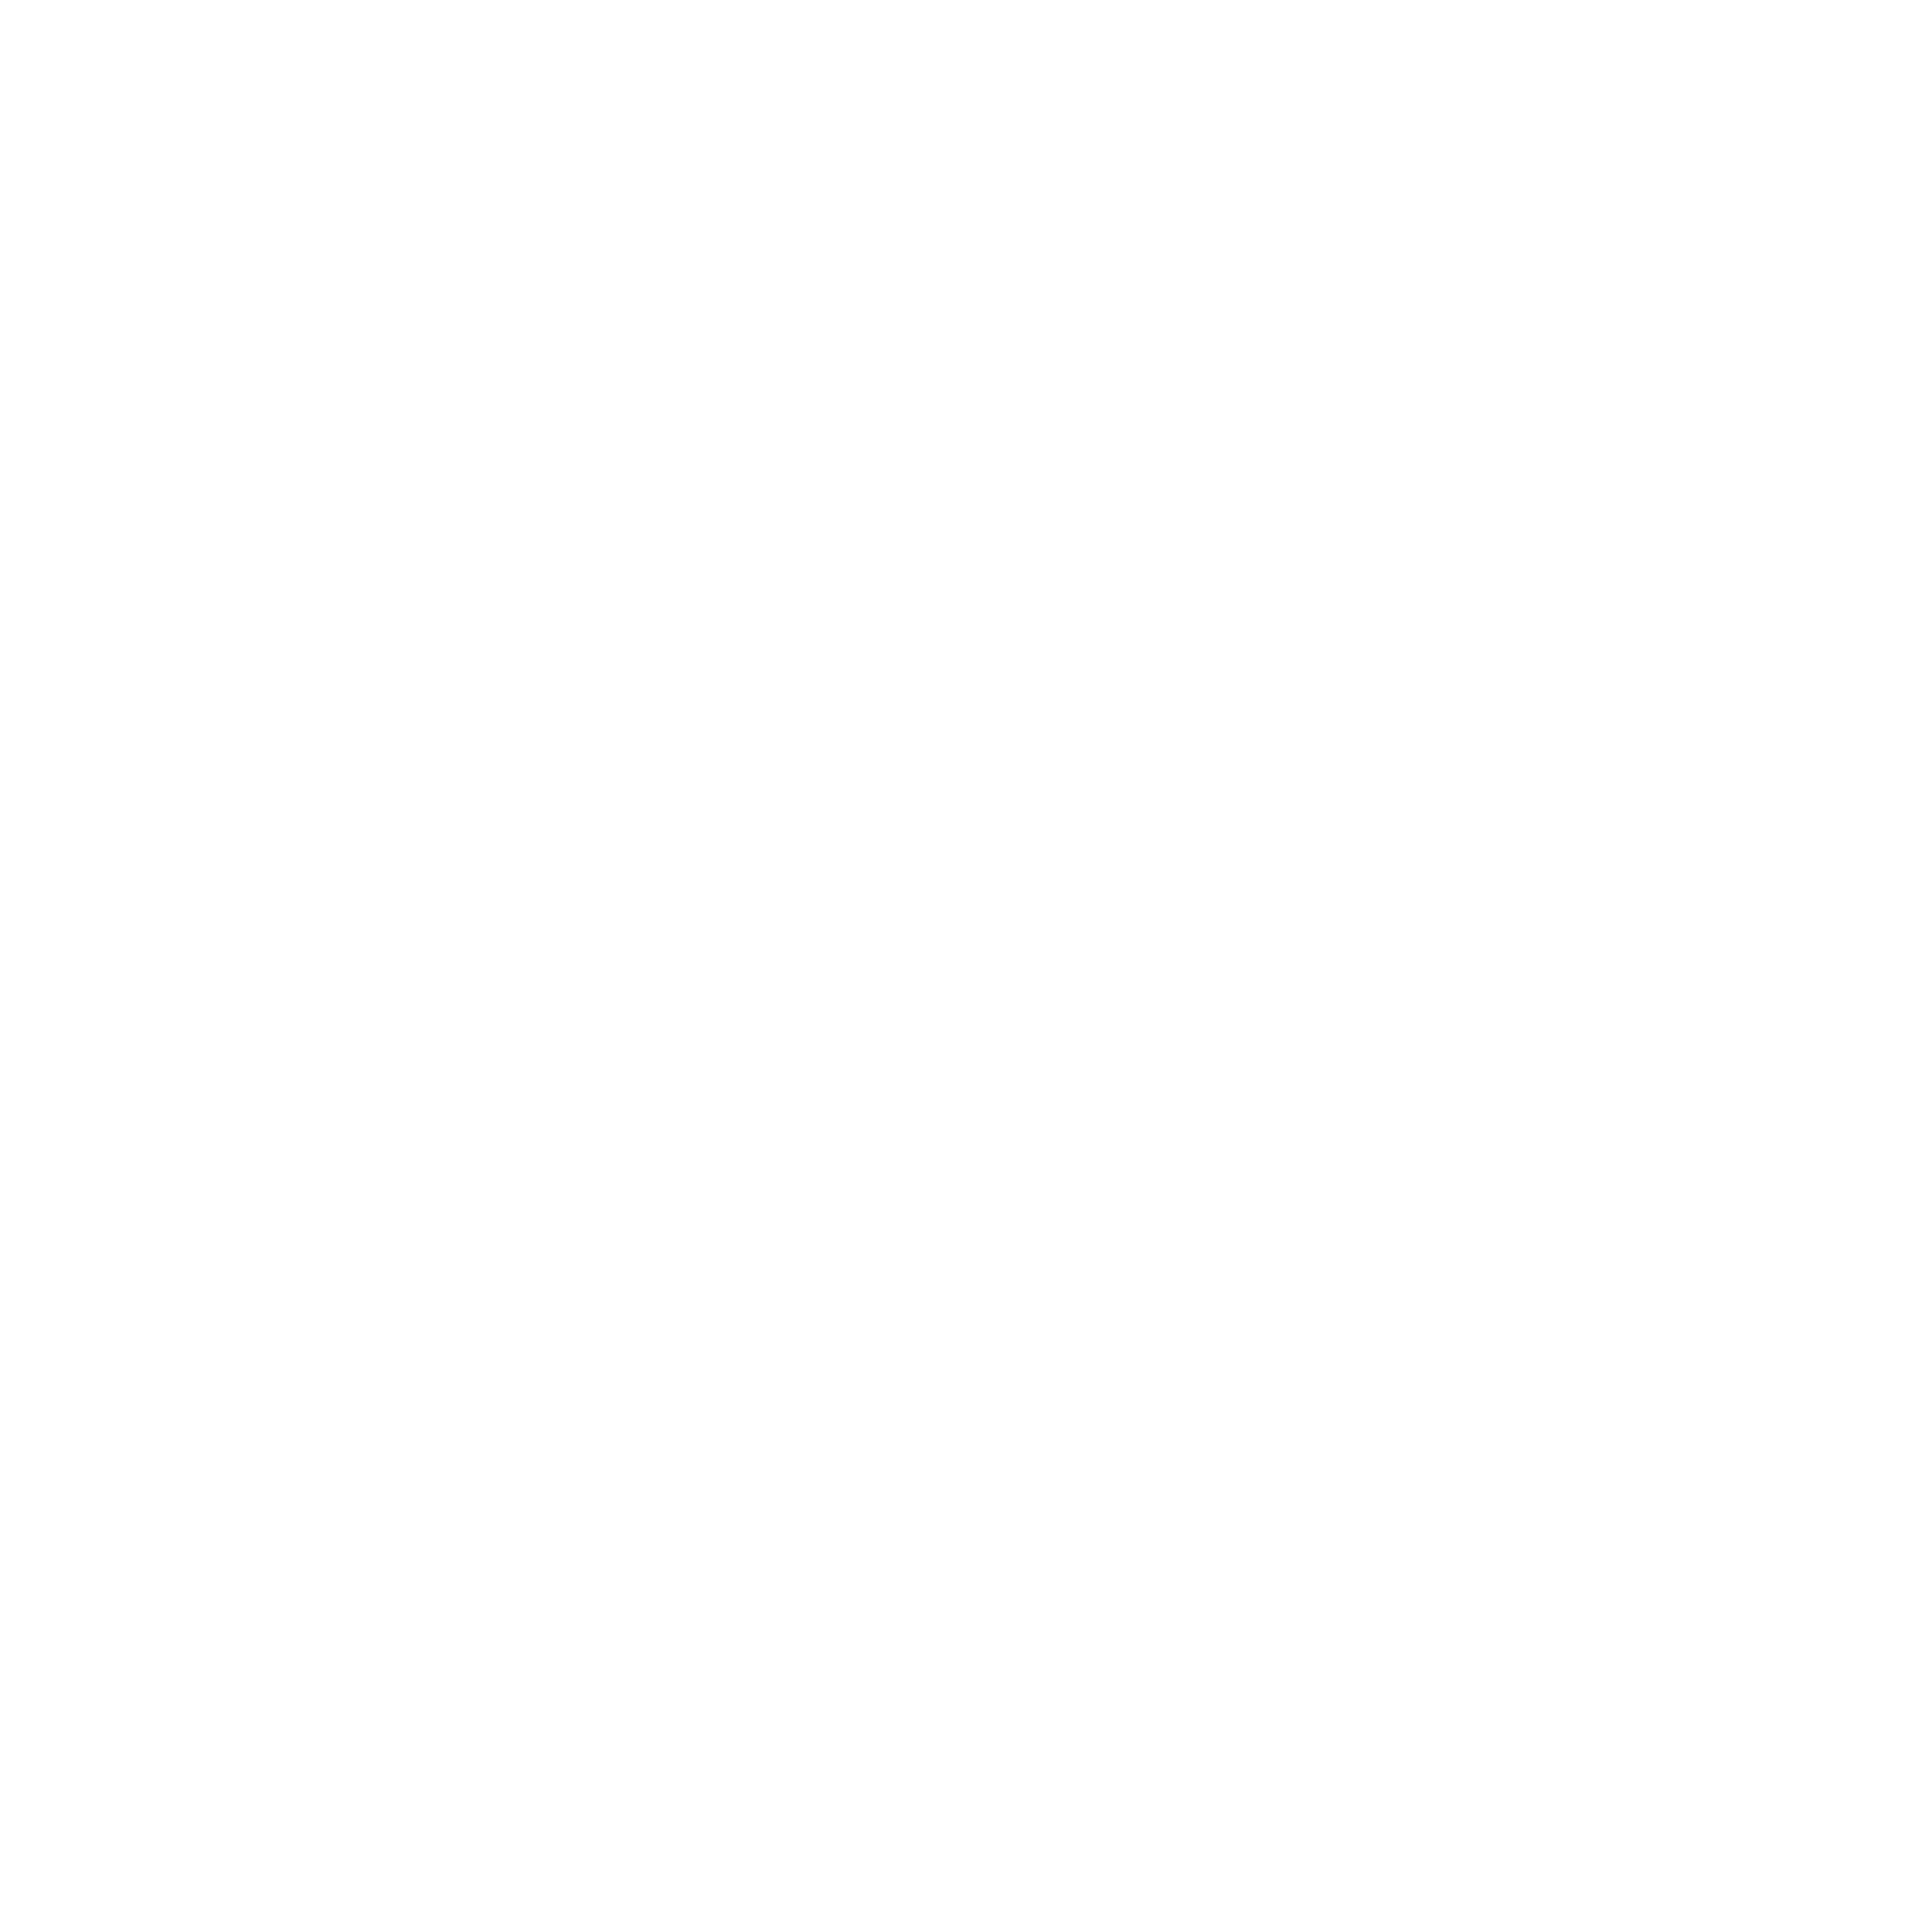 Orso-LOGO-white-RGB-01.png